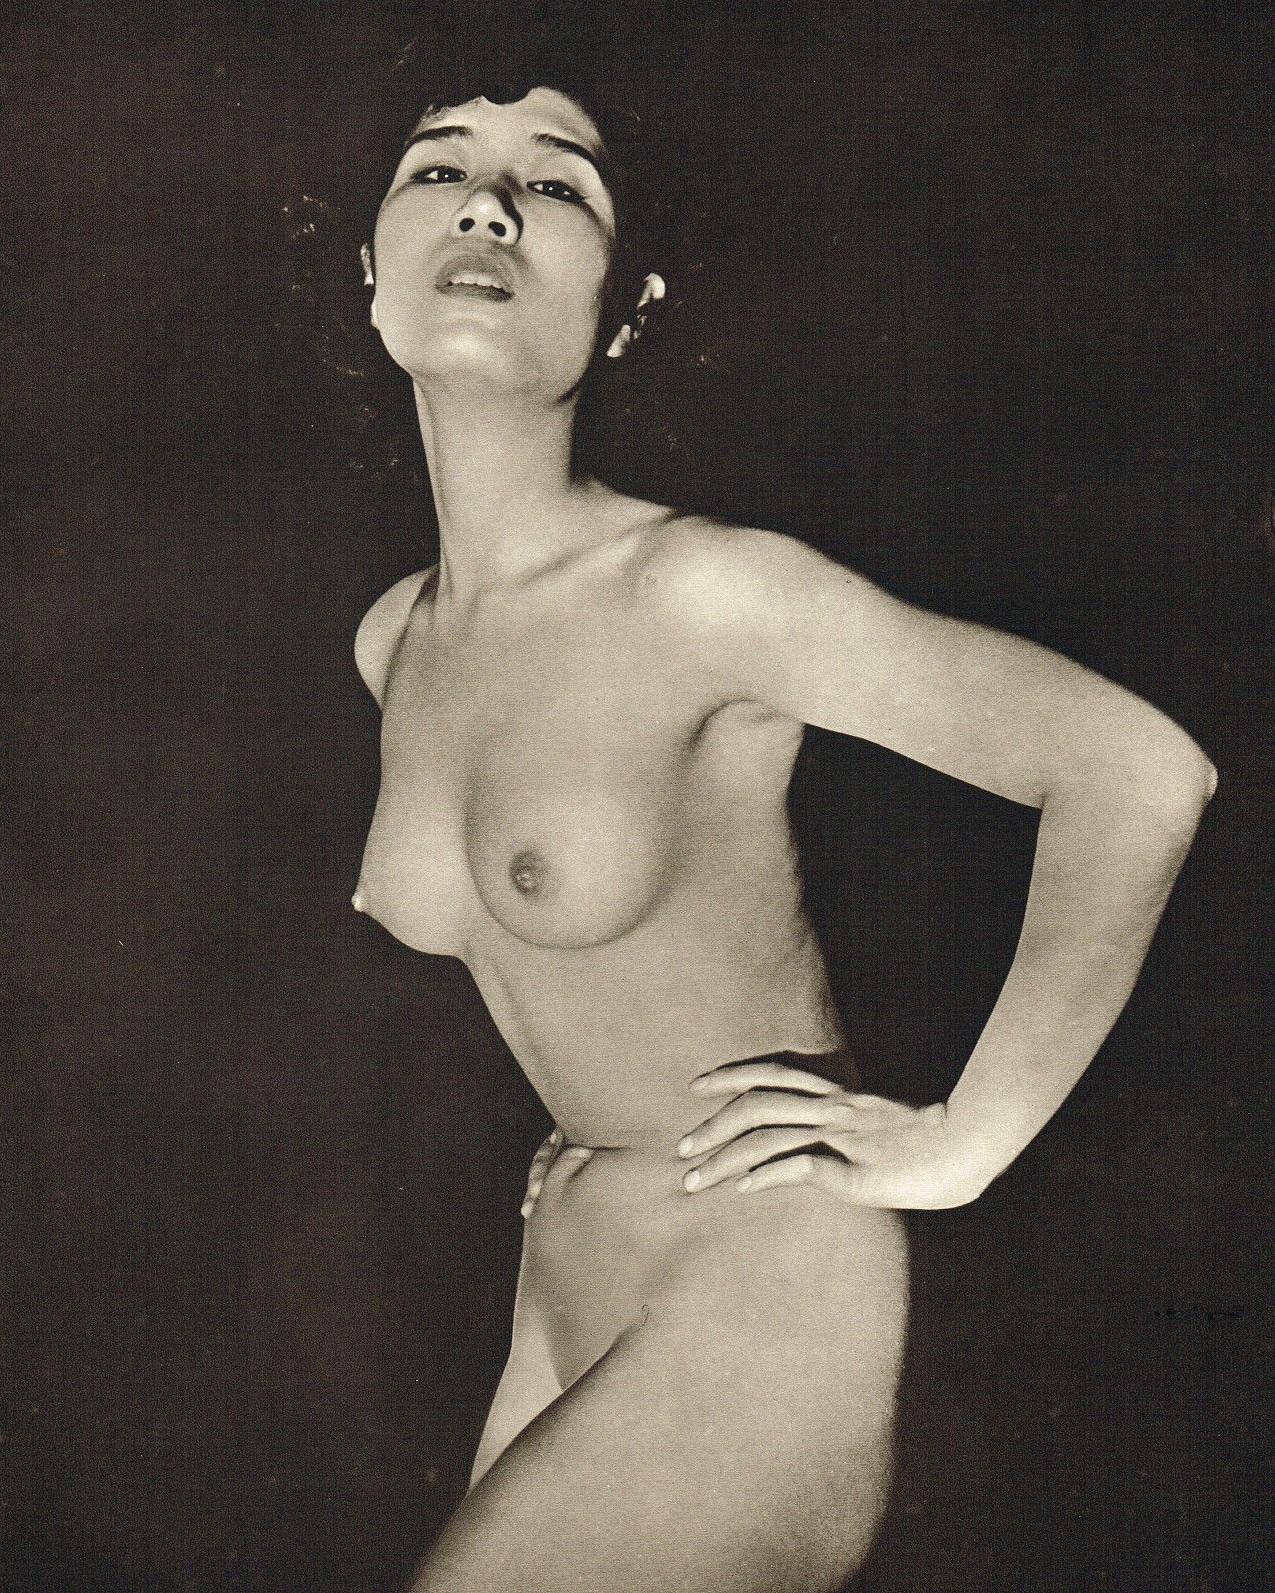 John Everard- Japanese Nude photogravure 1950Oriental Model Published by Robert Hale Ltd., London in 1955.